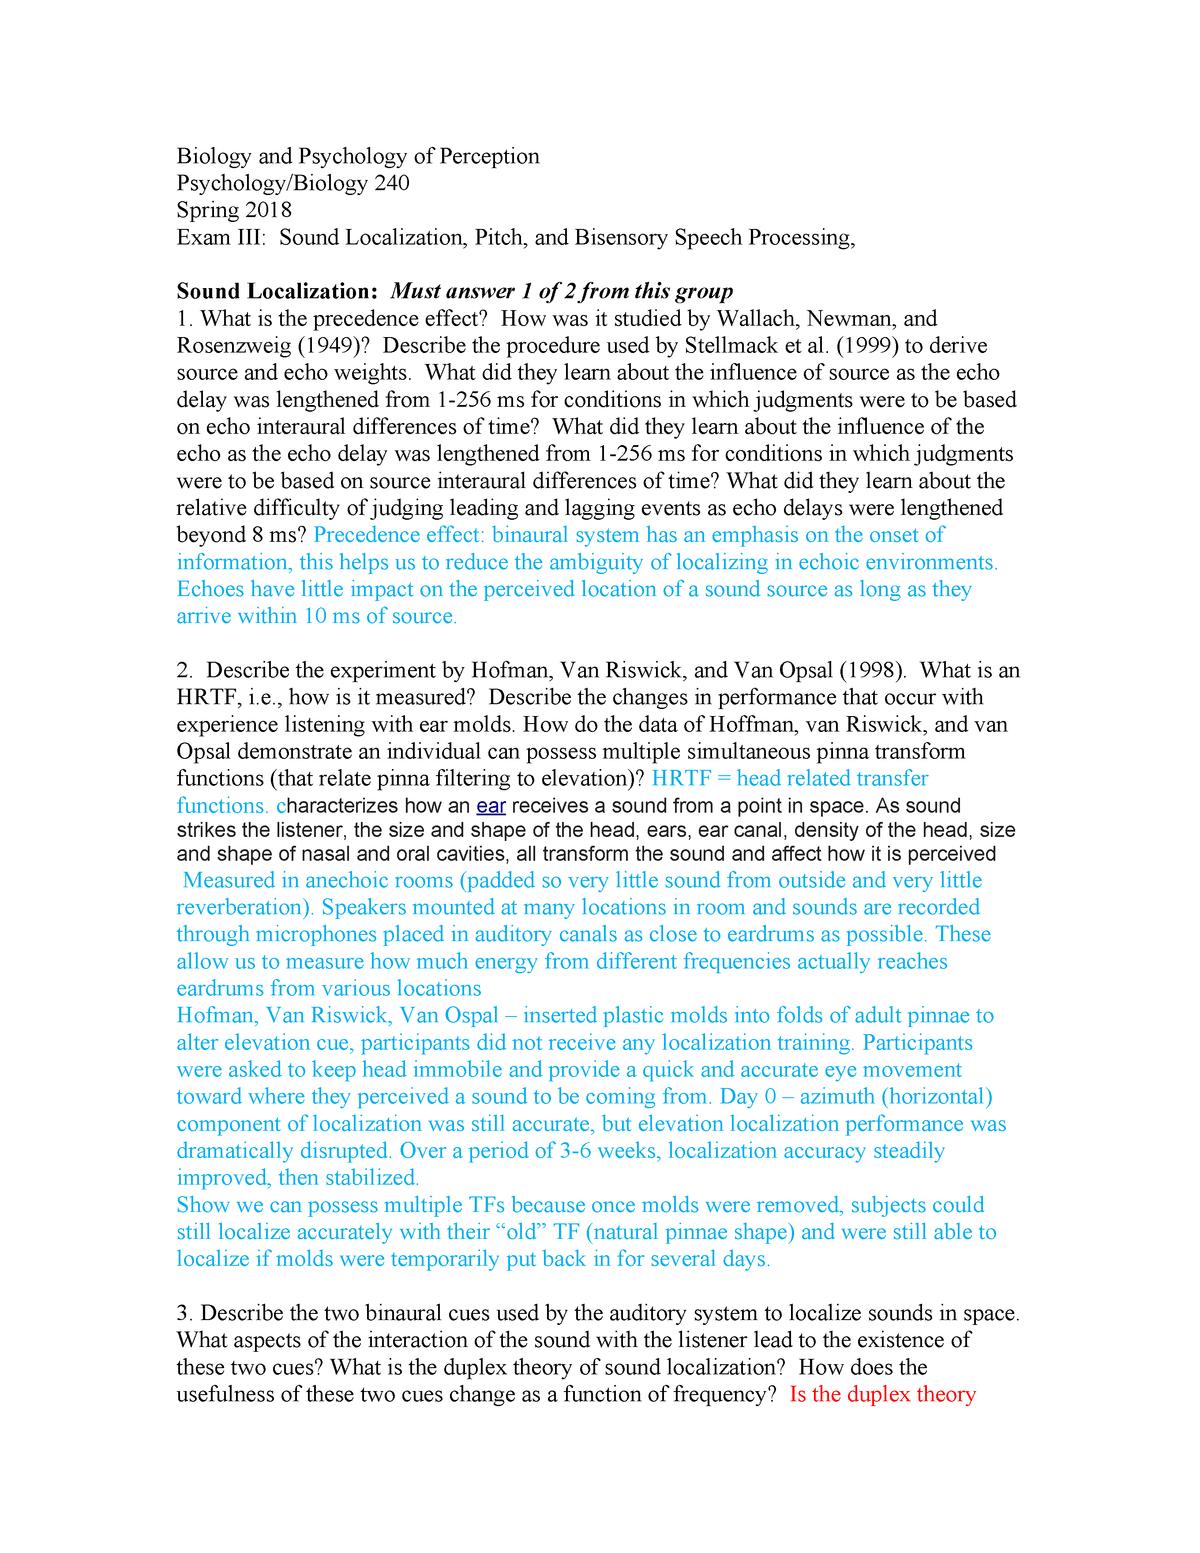 Exam 2018 - PSYC240: Psychology & Biology of Perception - StuDocu